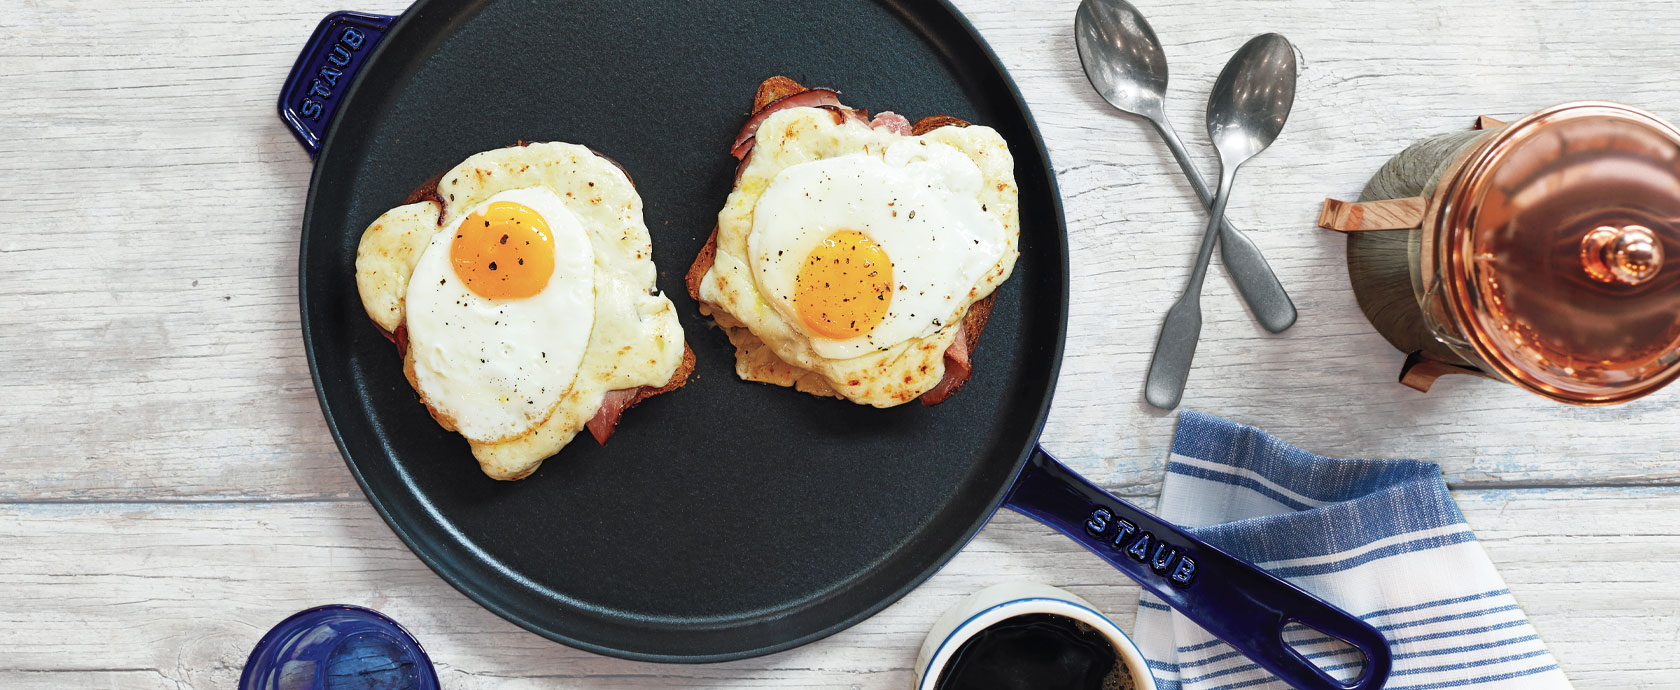 fried eggs in Staub cast iron skillet